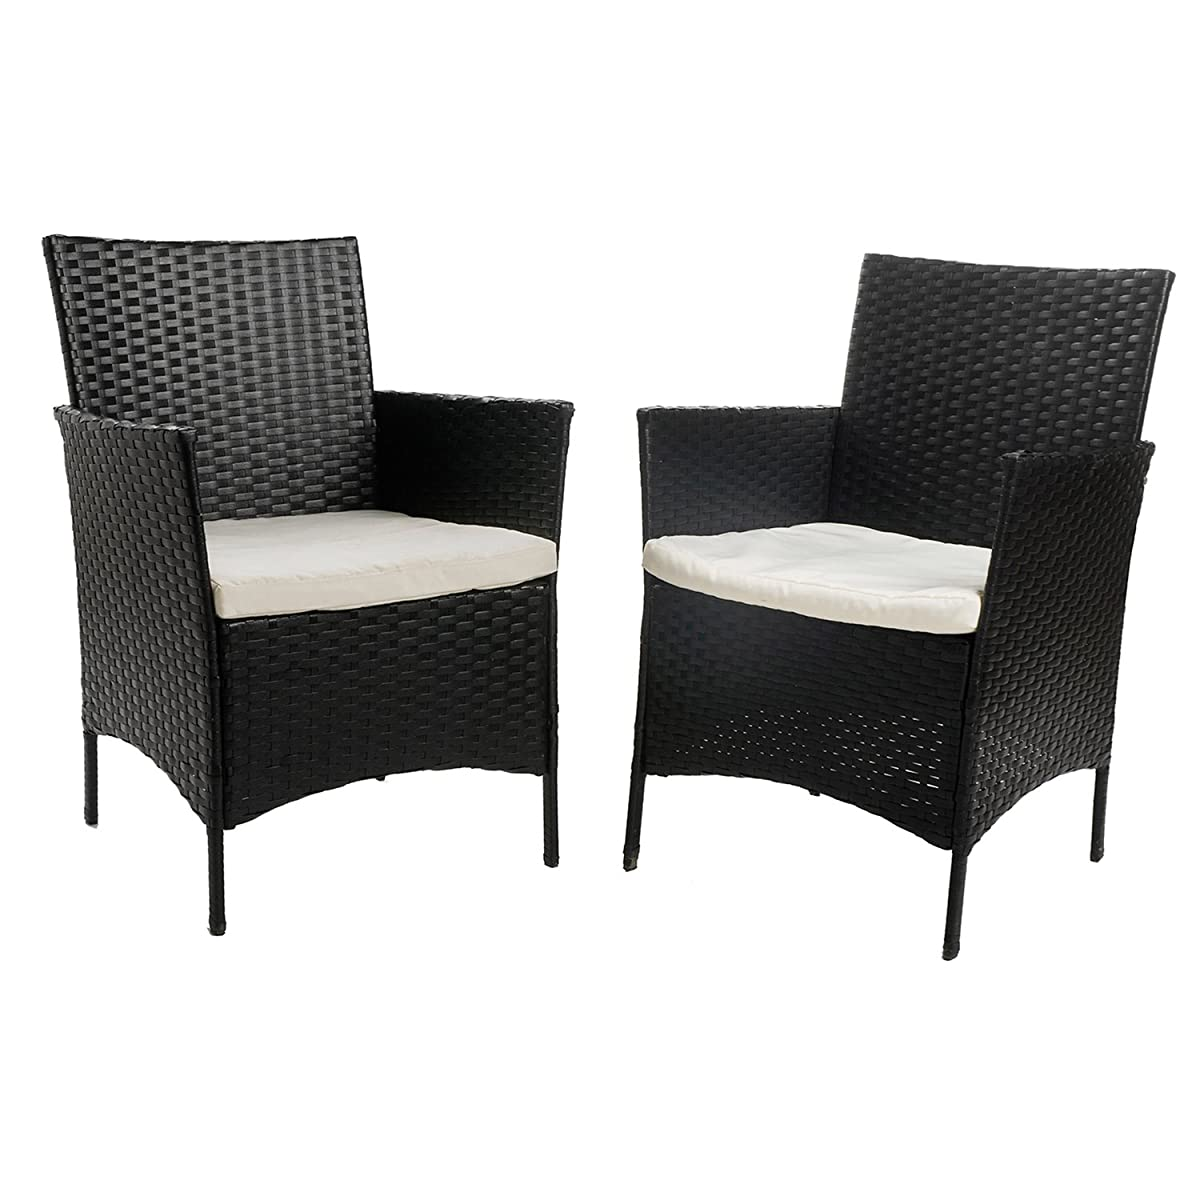 Merax 4-piece Outdoor PE Rattan Wicker Sofa and Chairs Set Rattan Patio Garden Furniture Set